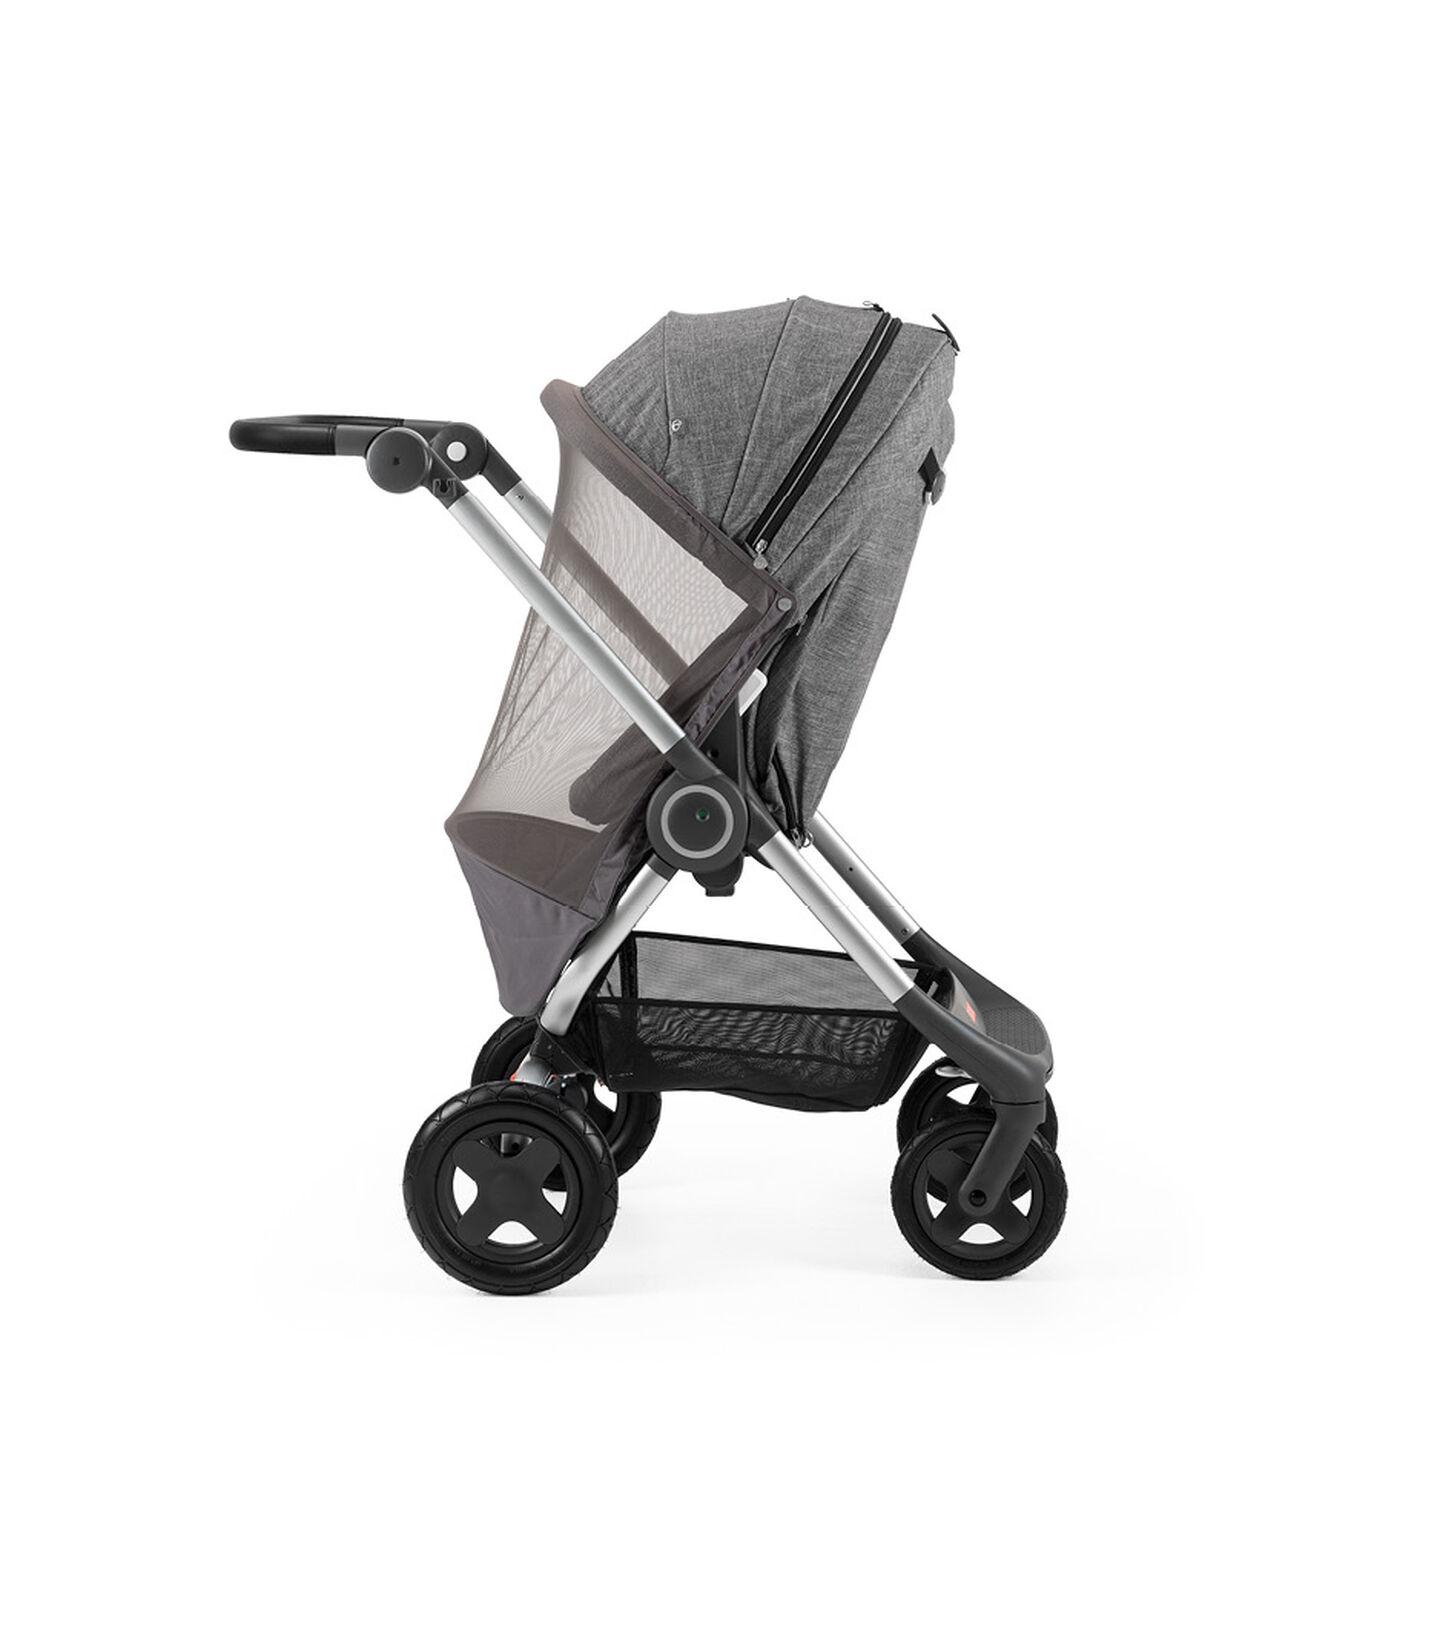 Stokke® Scoot™ Black Melange. Leatherette handle. Parent facing, active position. Mosquito net. view 1